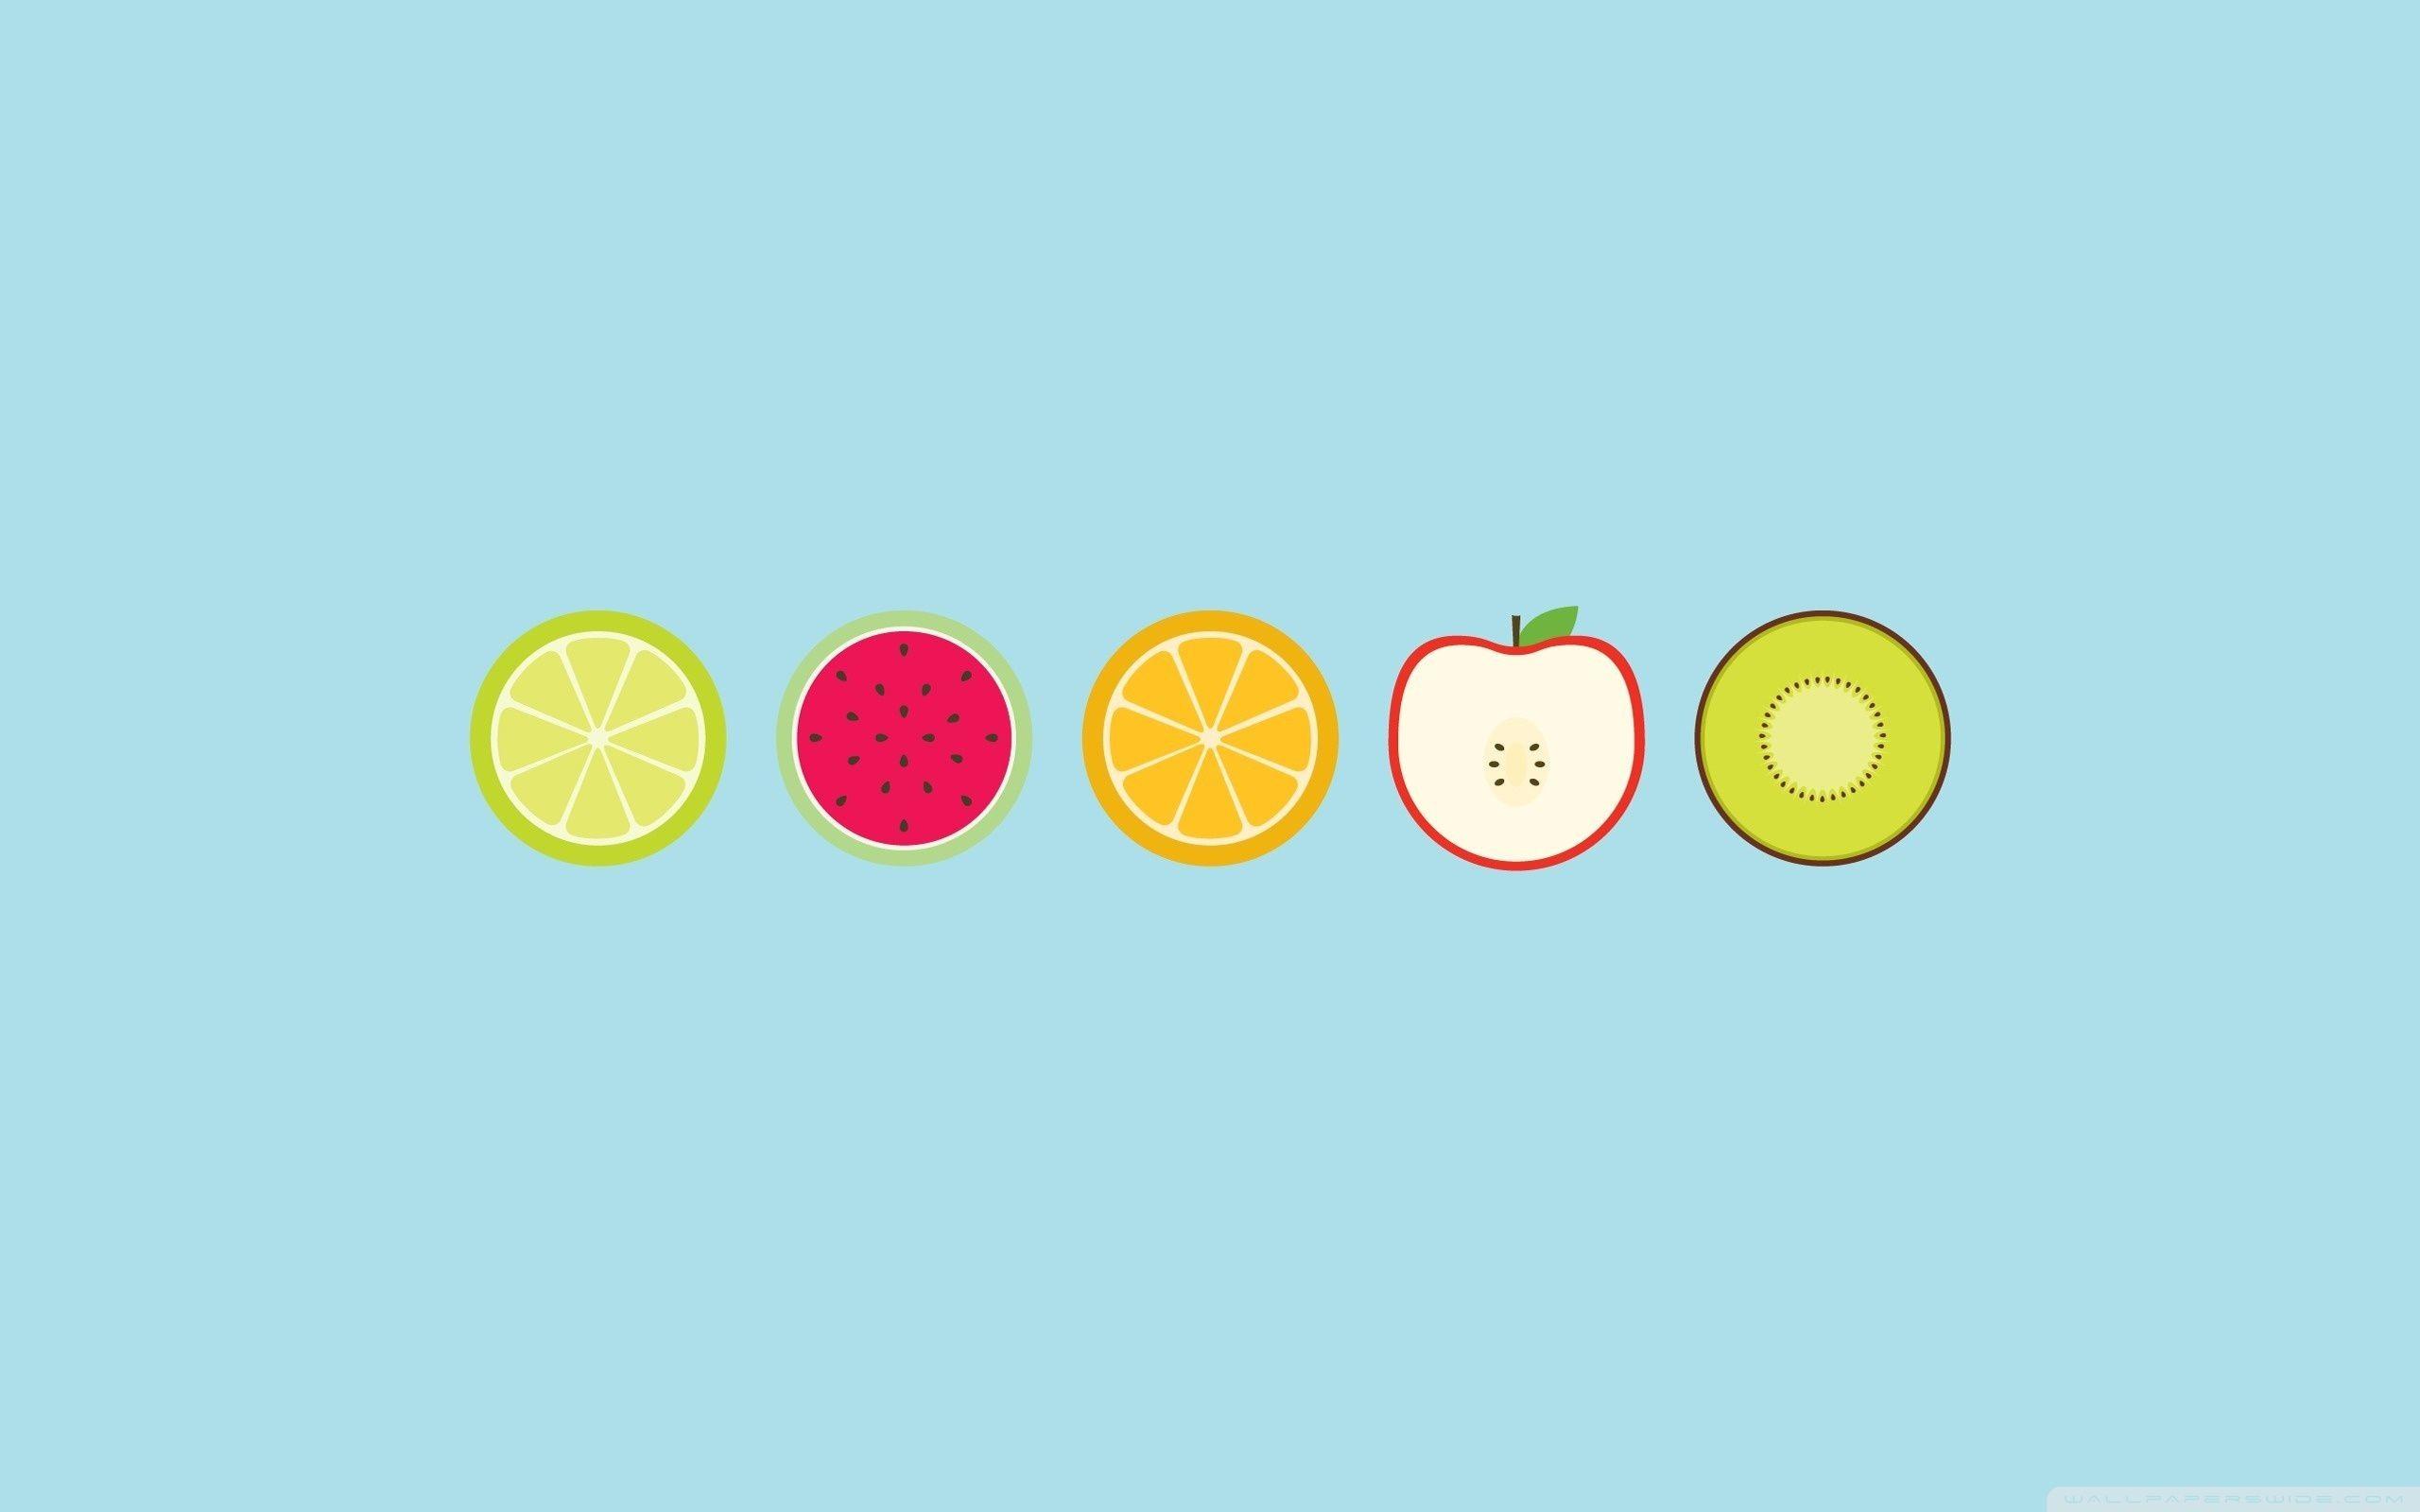 Cute Fruit Wallpaper 54 Images